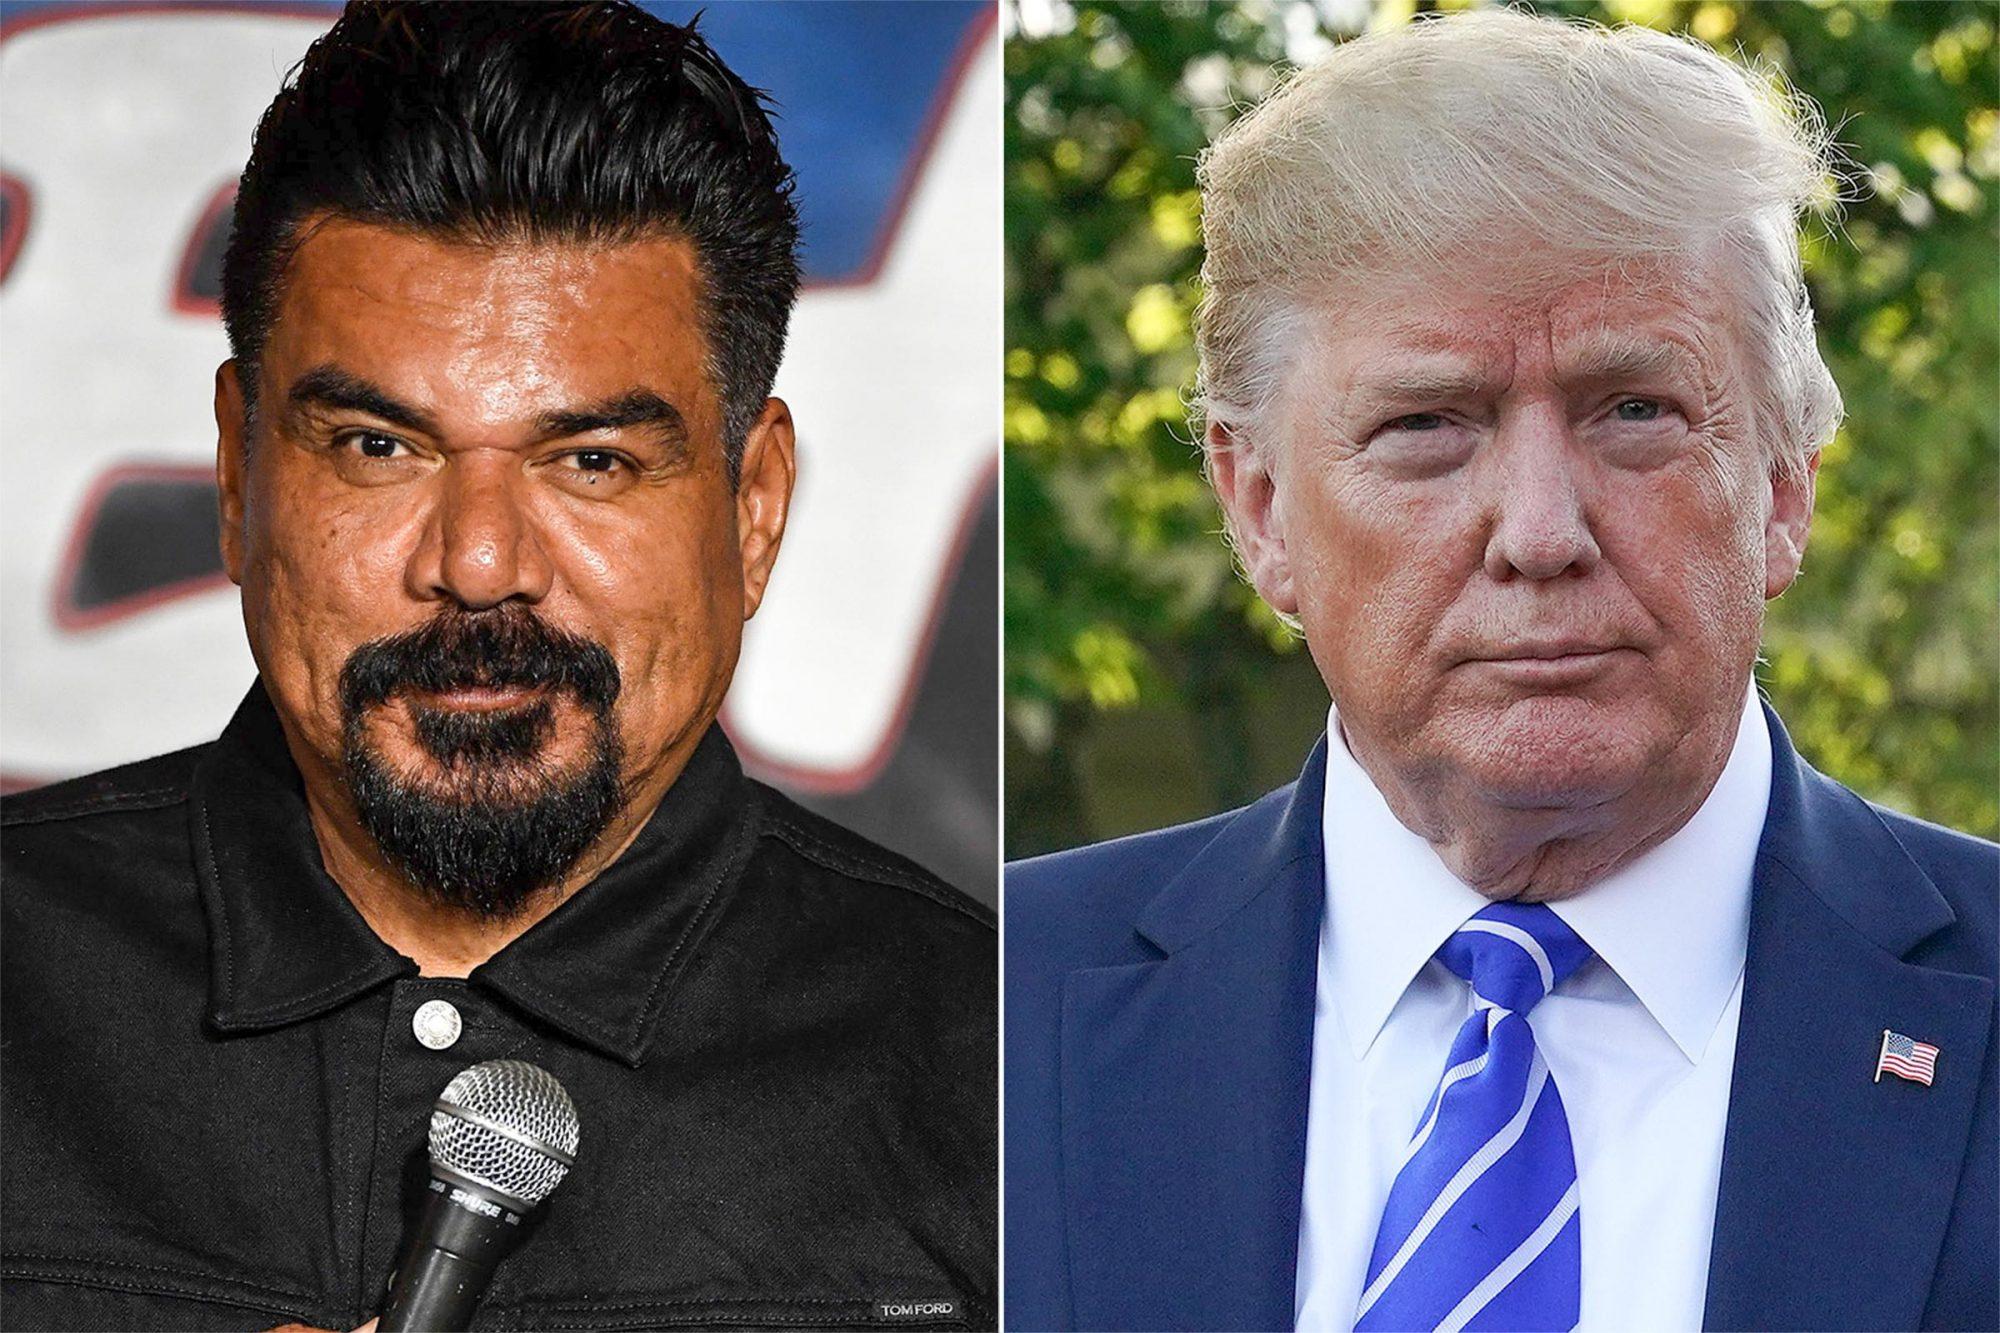 George Lopez / Donald Trump